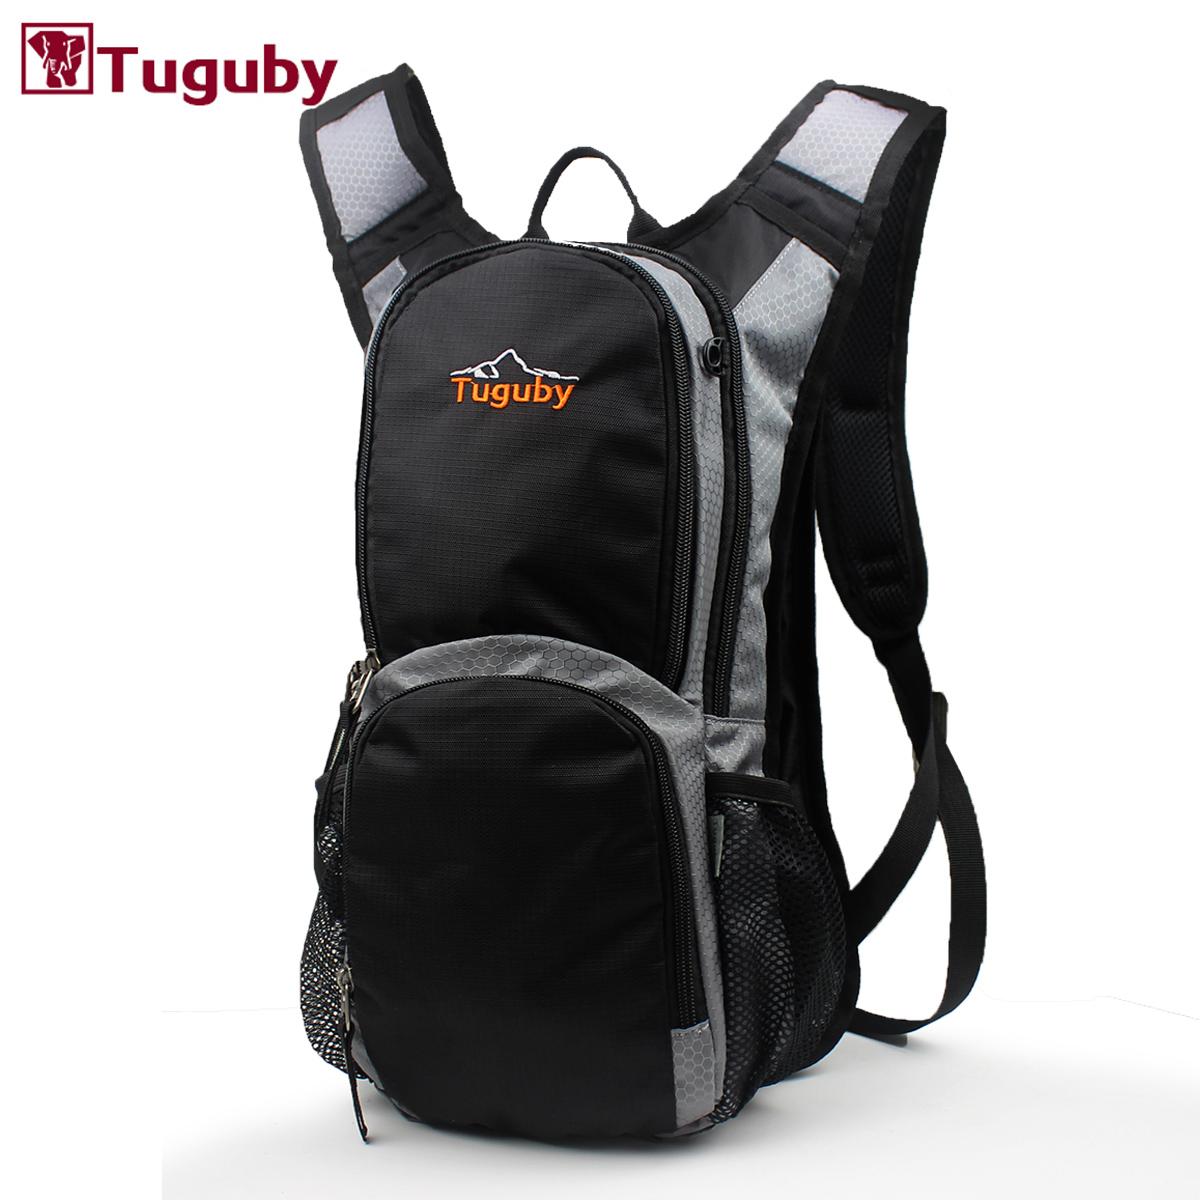 Small Light Travel Backpack- Fenix Toulouse Handball f5d5fe0a35ca7